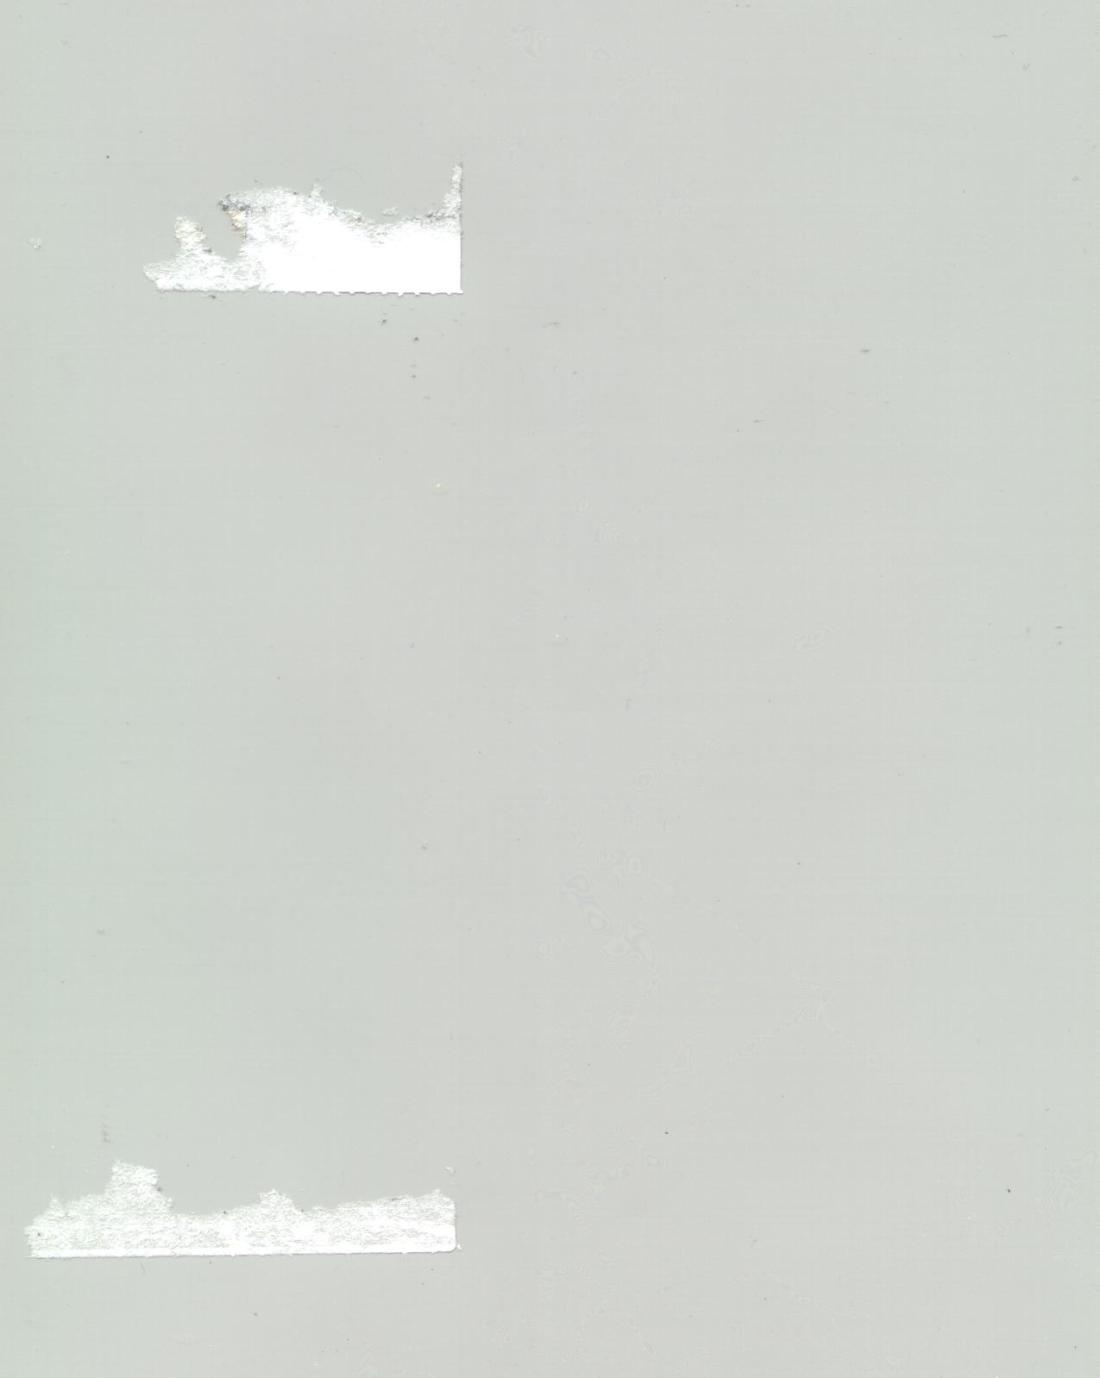 uscc015